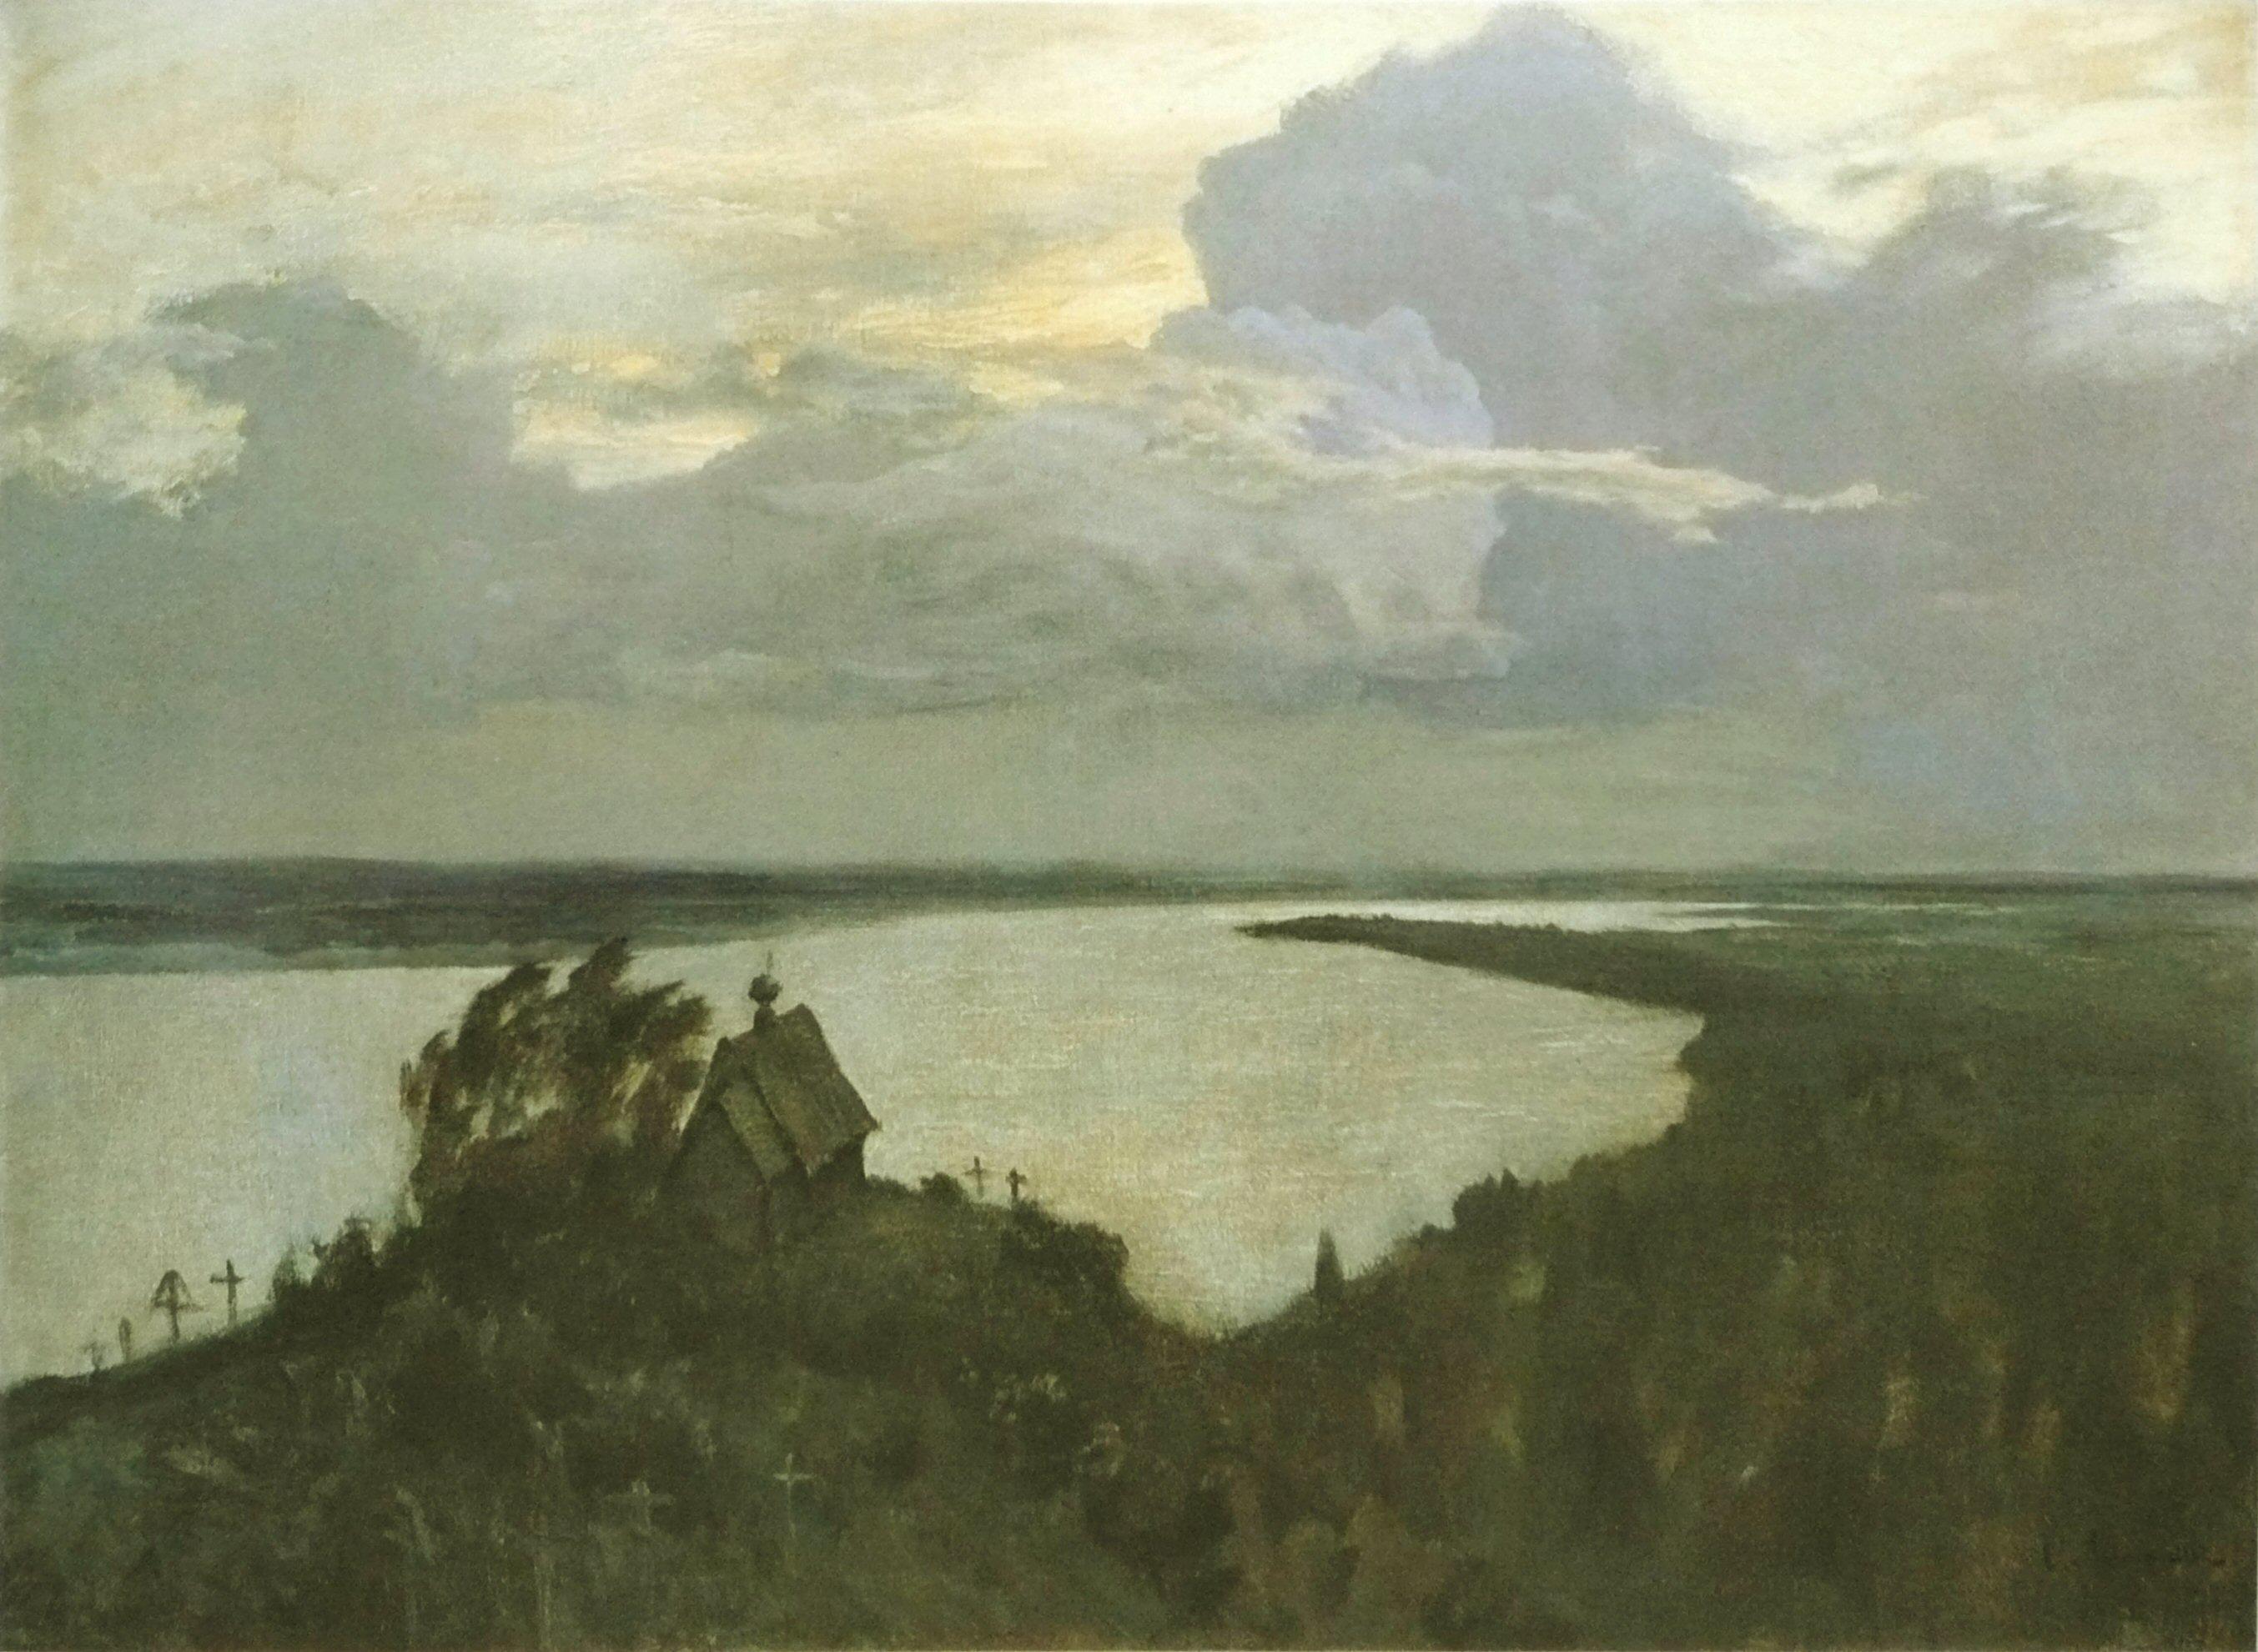 Realism 19th century